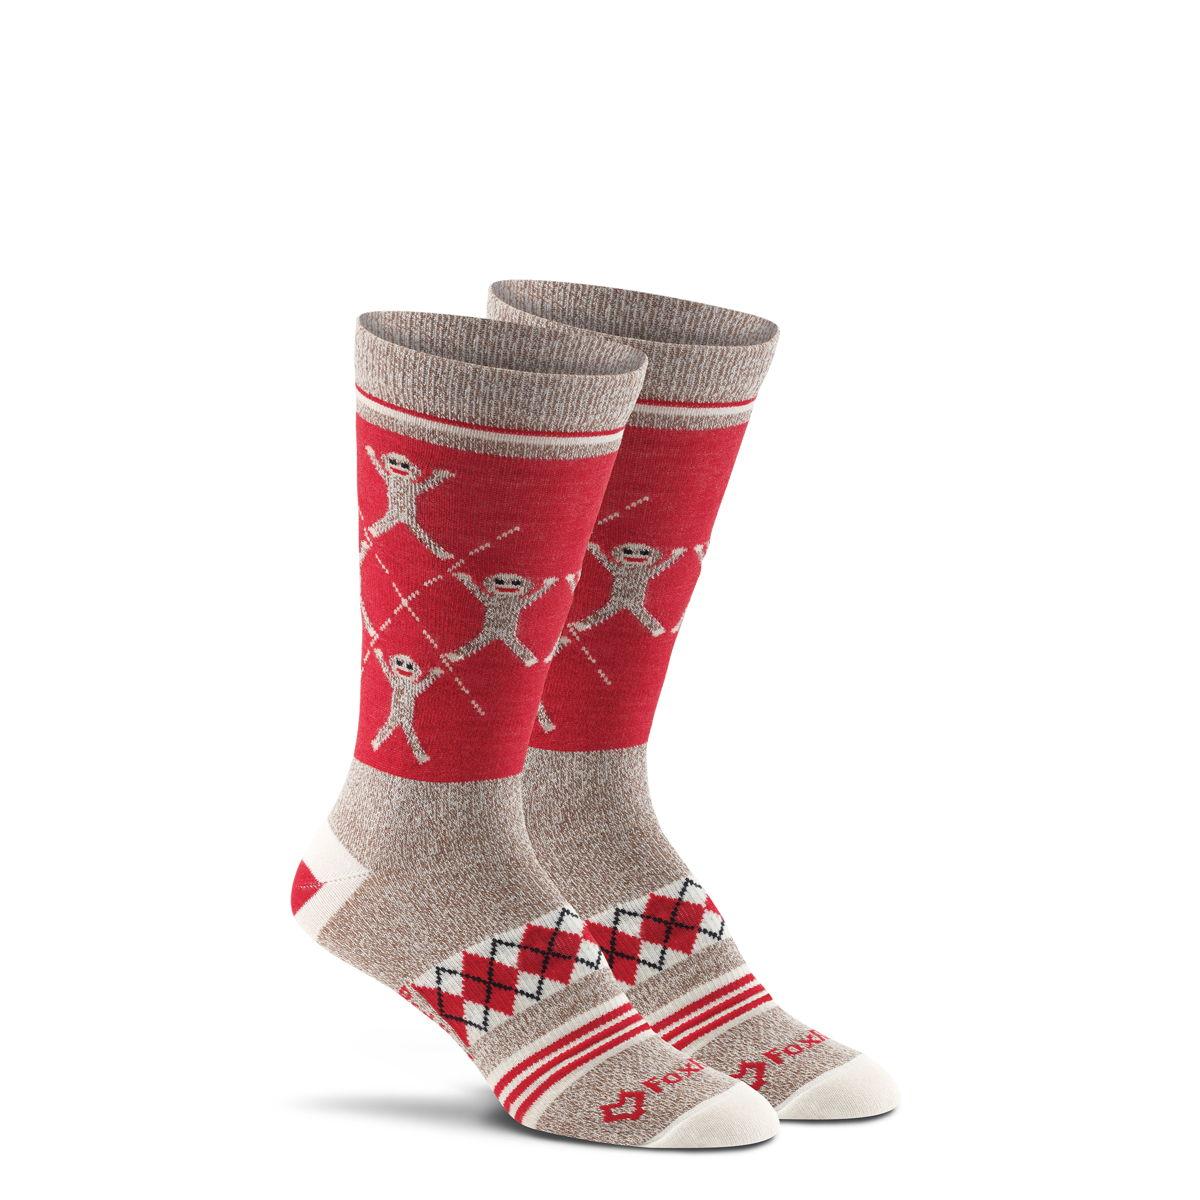 Sock Monkey – Fox River® Socks